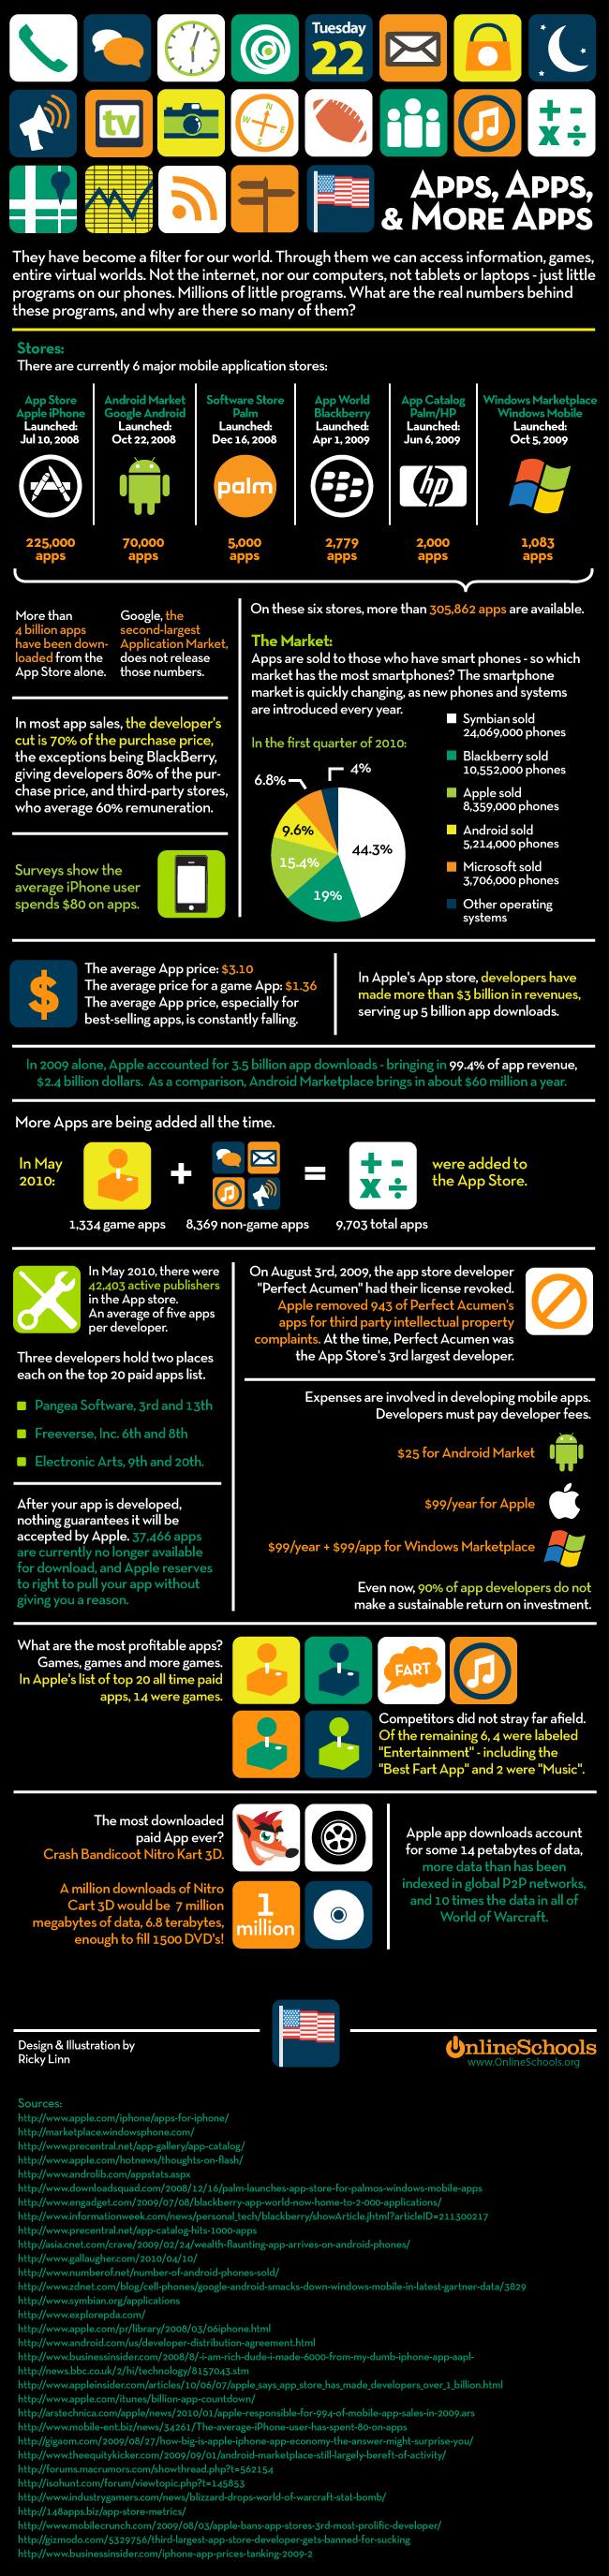 Infográfico - Apps, apps e mais apps